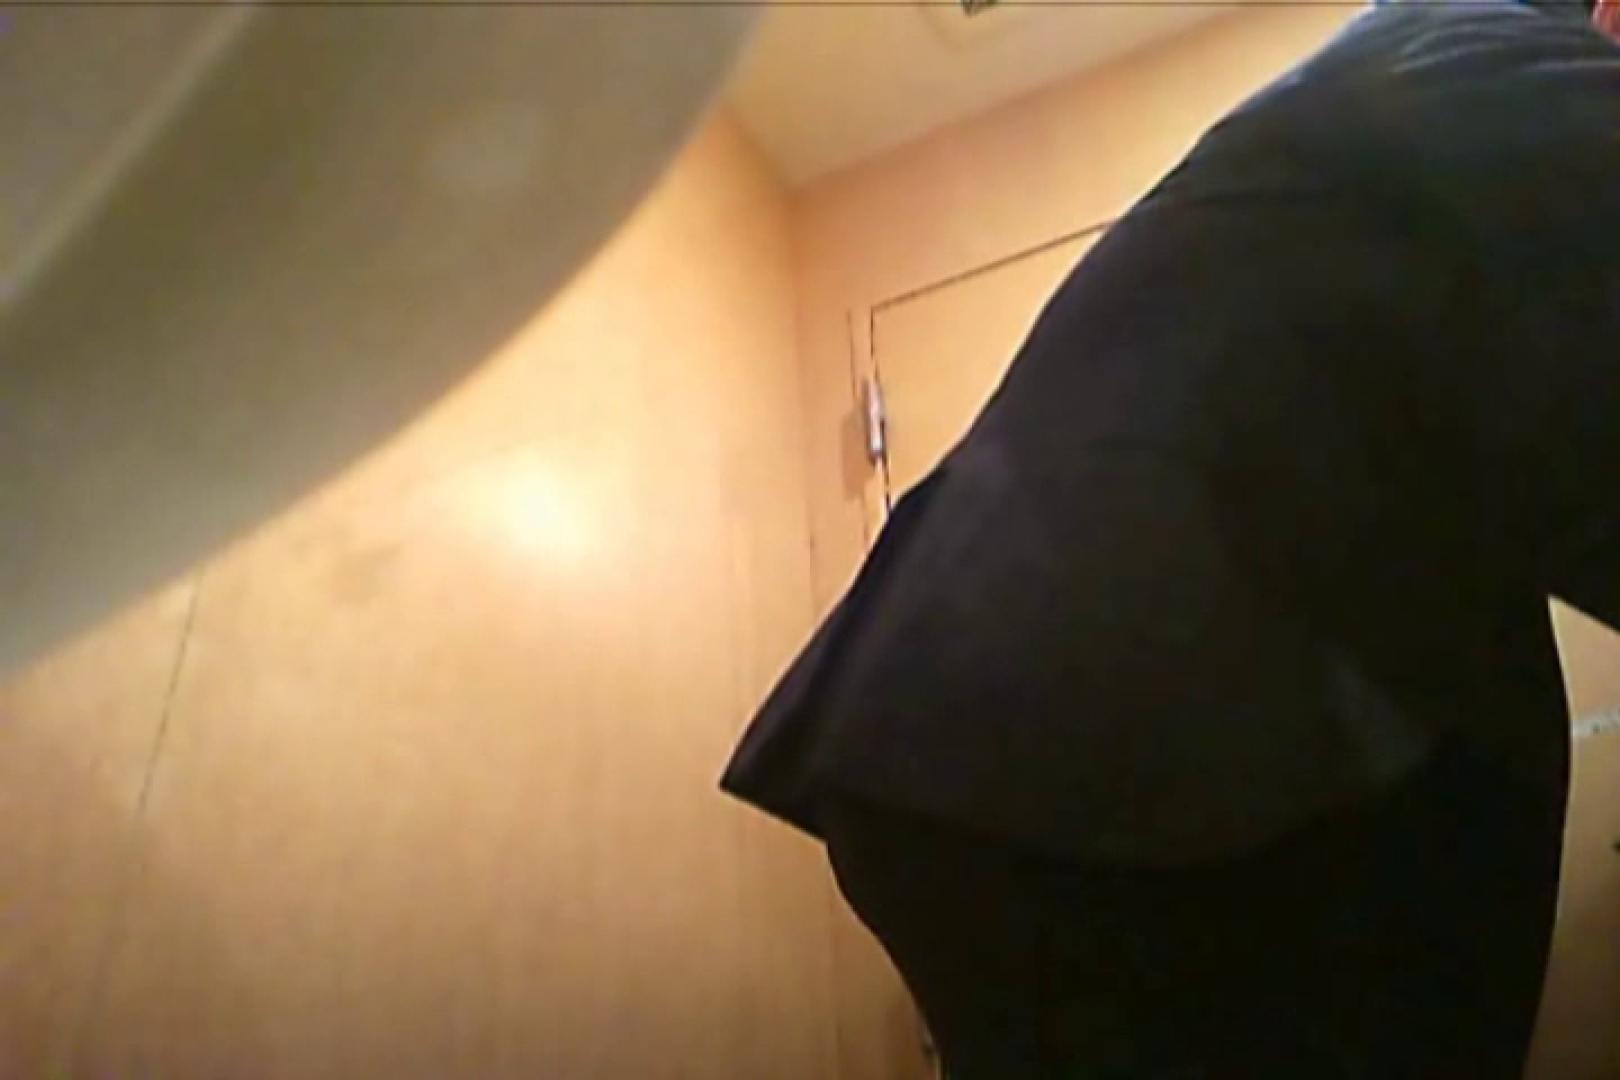 Gボーイ初投稿!掴み取りさんの洗面所覗き!in新幹線!VOL.18 リーマン系な男たち ゲイフリーエロ画像 106連発 60